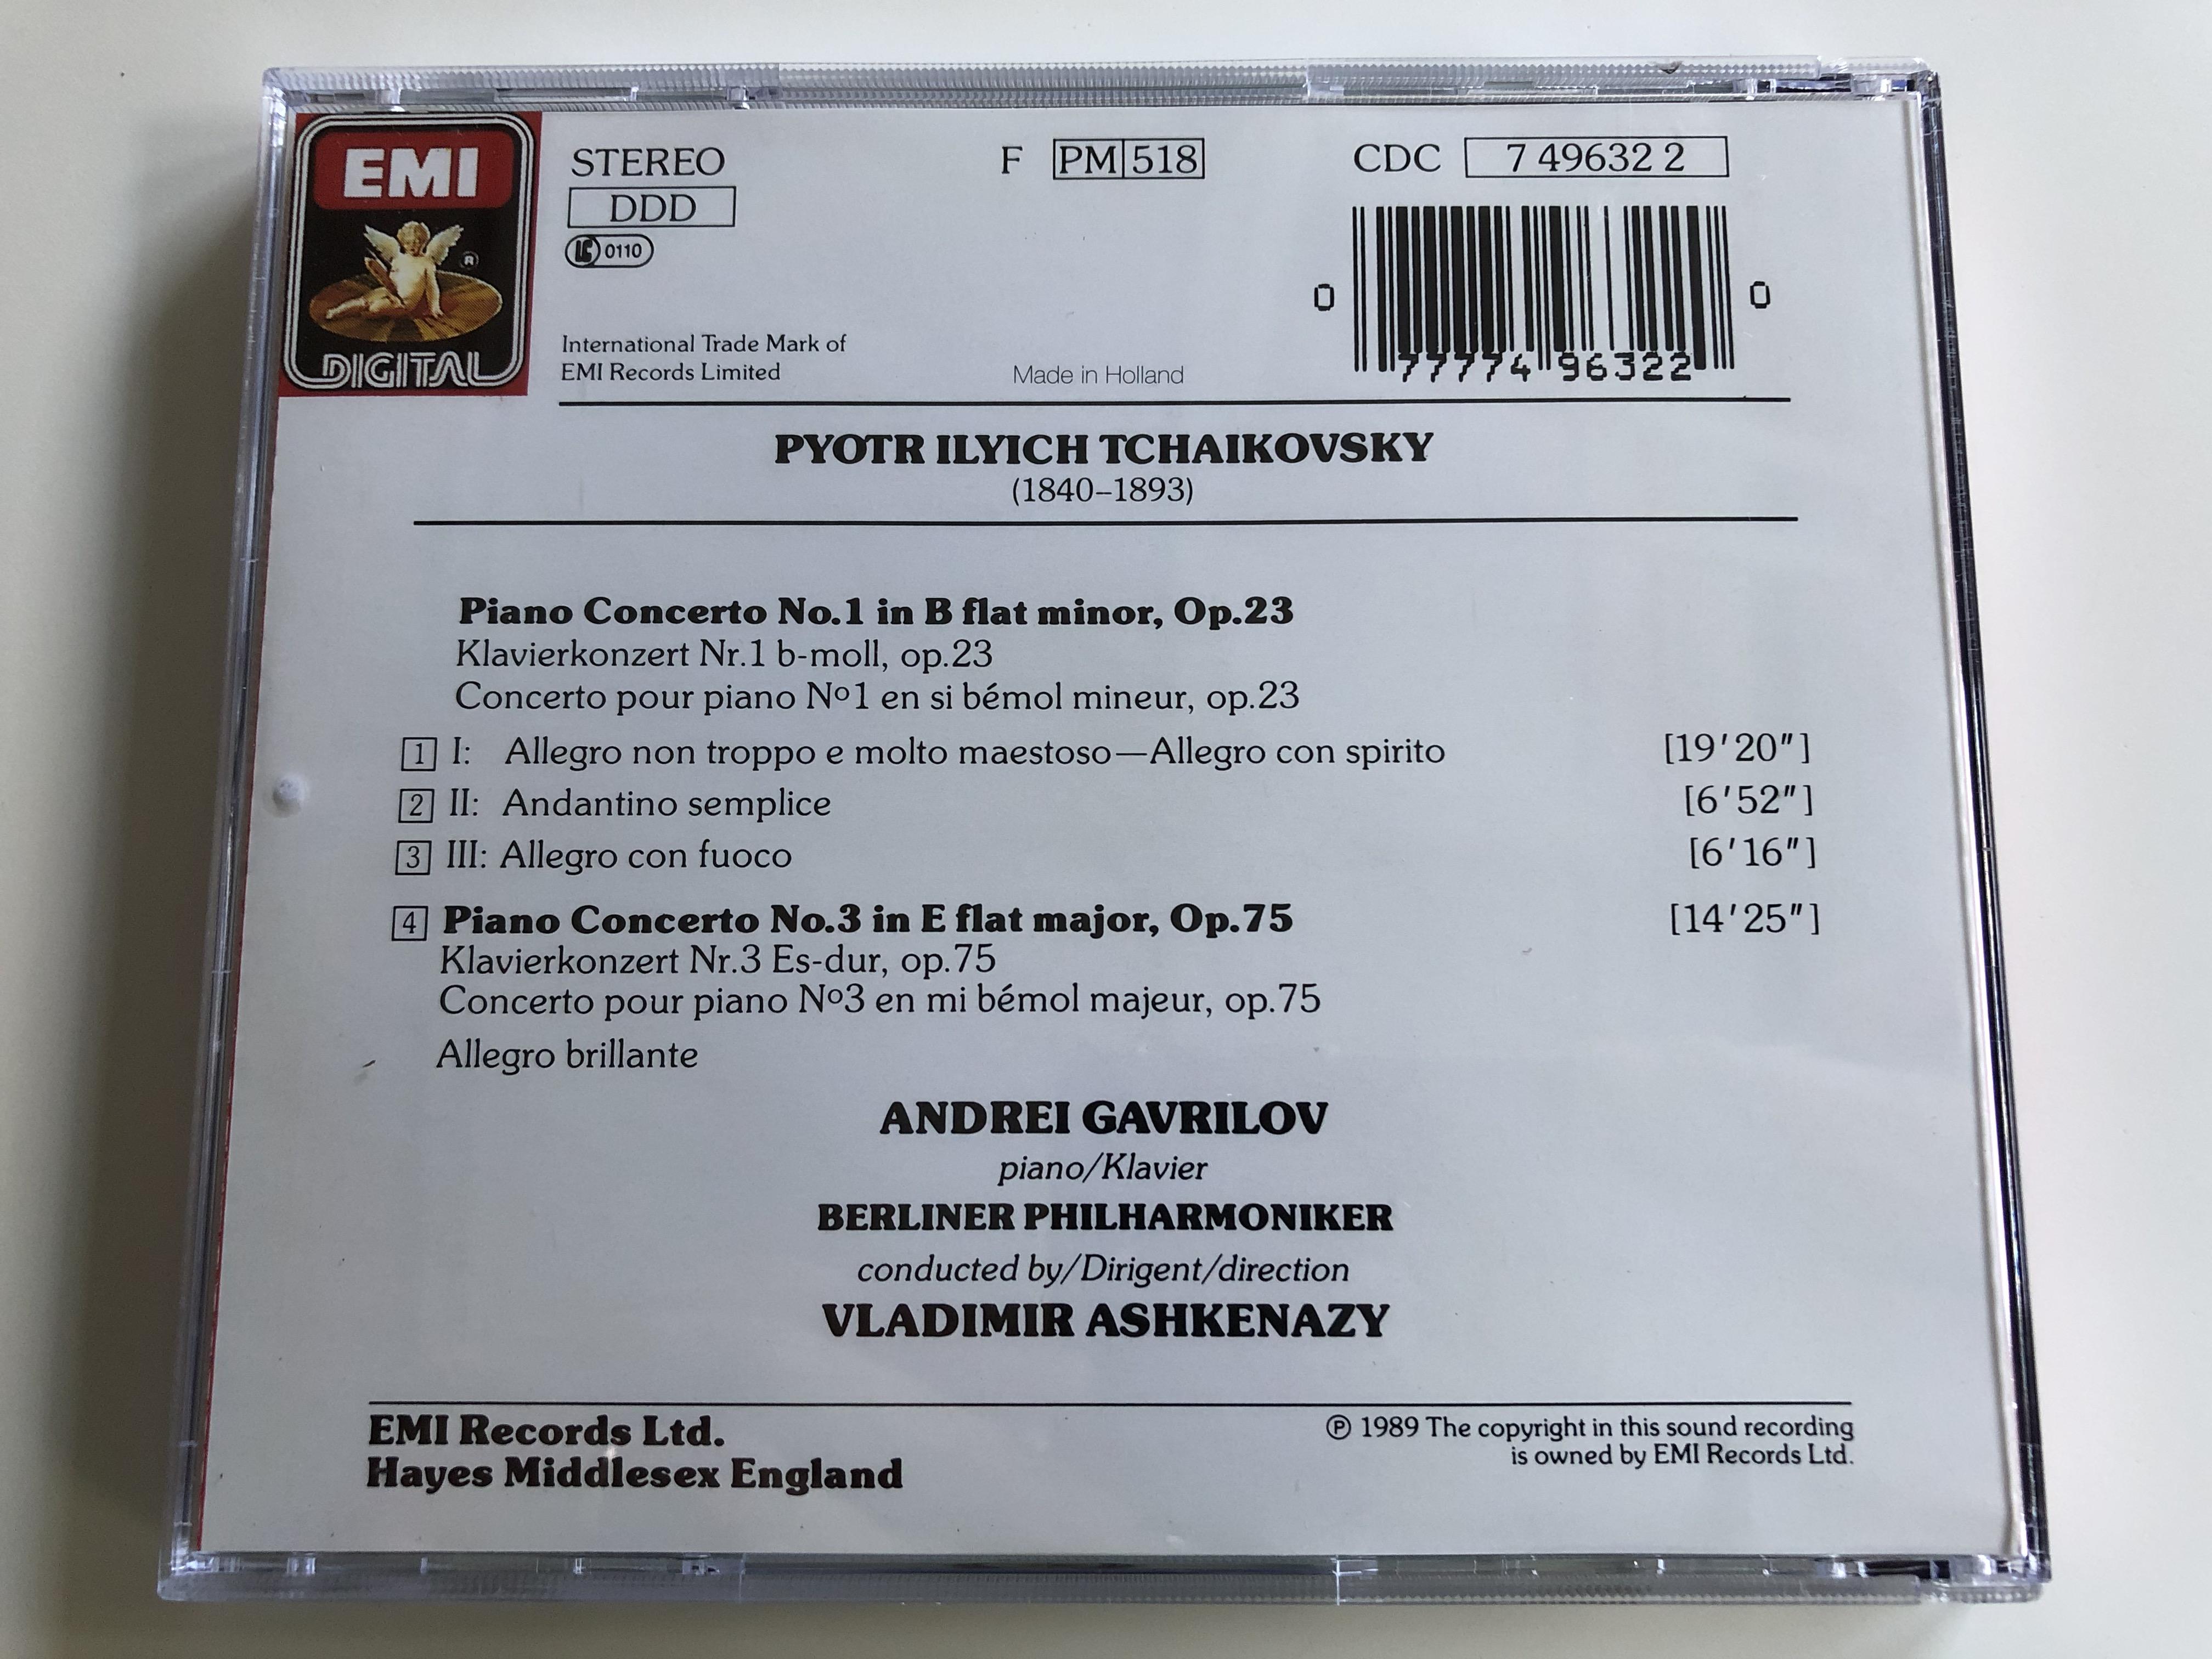 tchaikovsky-piano-concertos-klavierkonzerte-concertos-pour-piano-1-3-andrei-gavrilov-berliner-philharmoniker-vladimir-ashkenazy-emi-audio-cd-1989-stereo-cdc-7-49632-2-5-.jpg